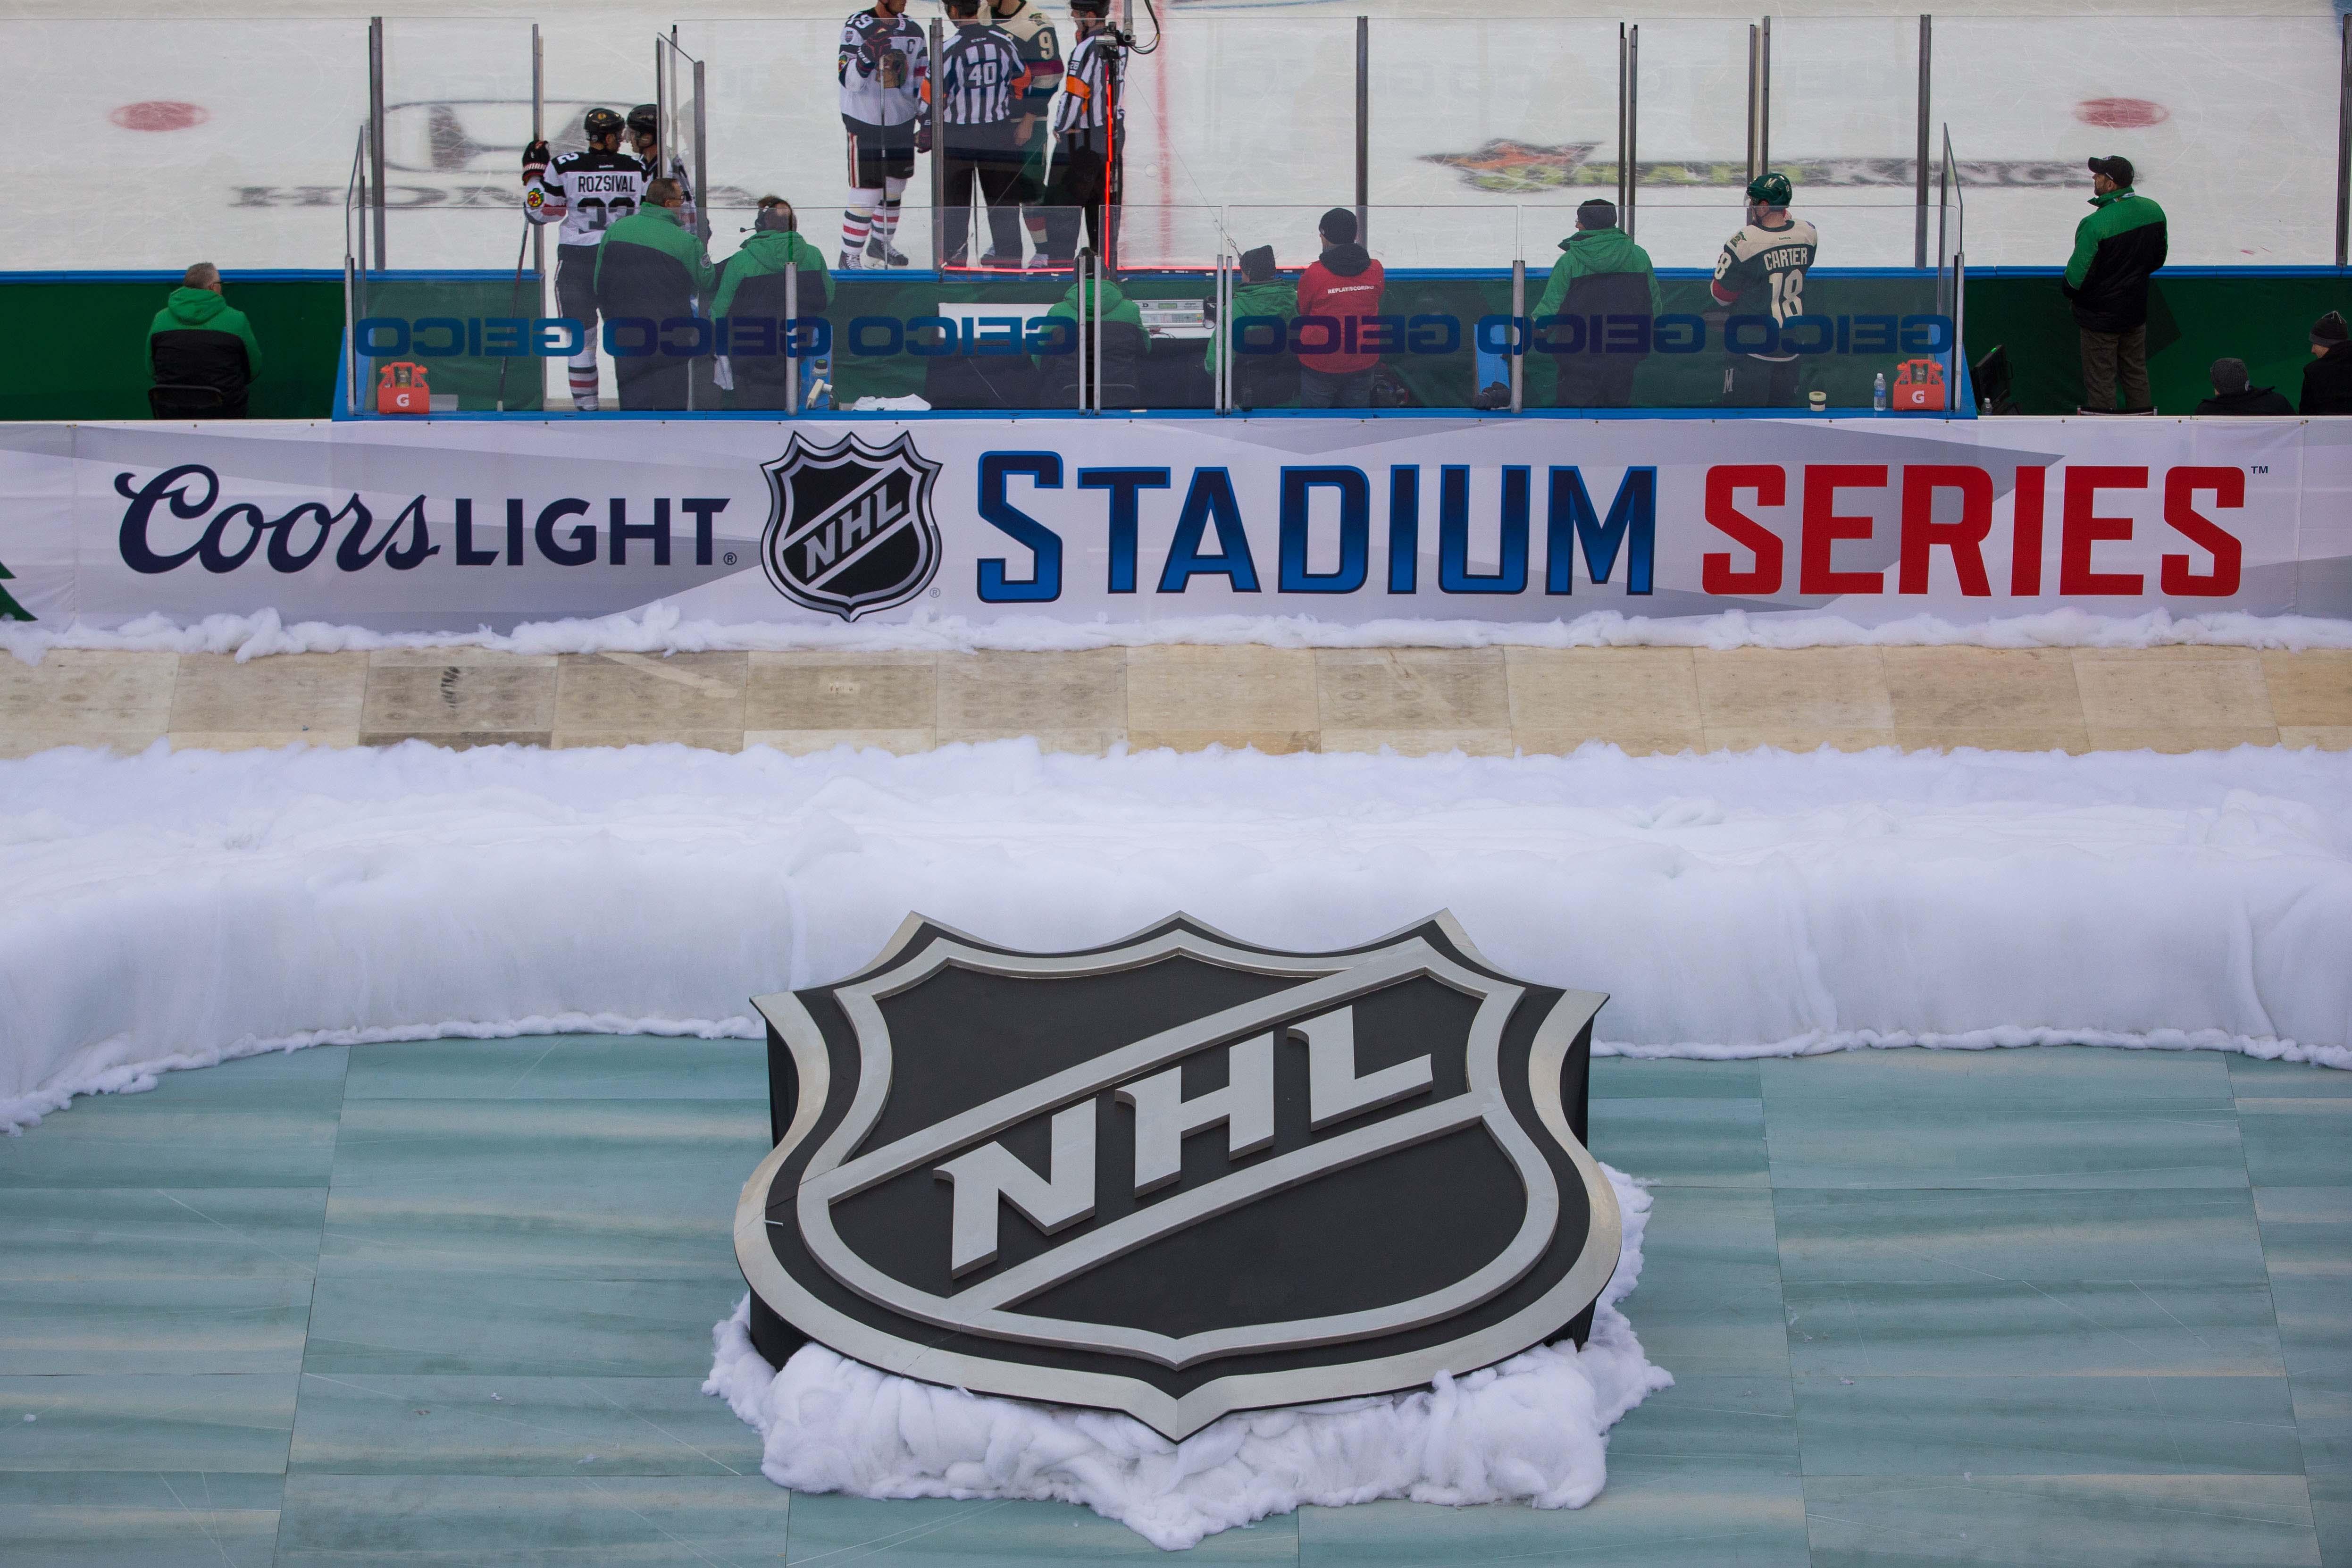 9133824-nhl-stadium-series-chicago-blackhawks-at-minnesota-wild